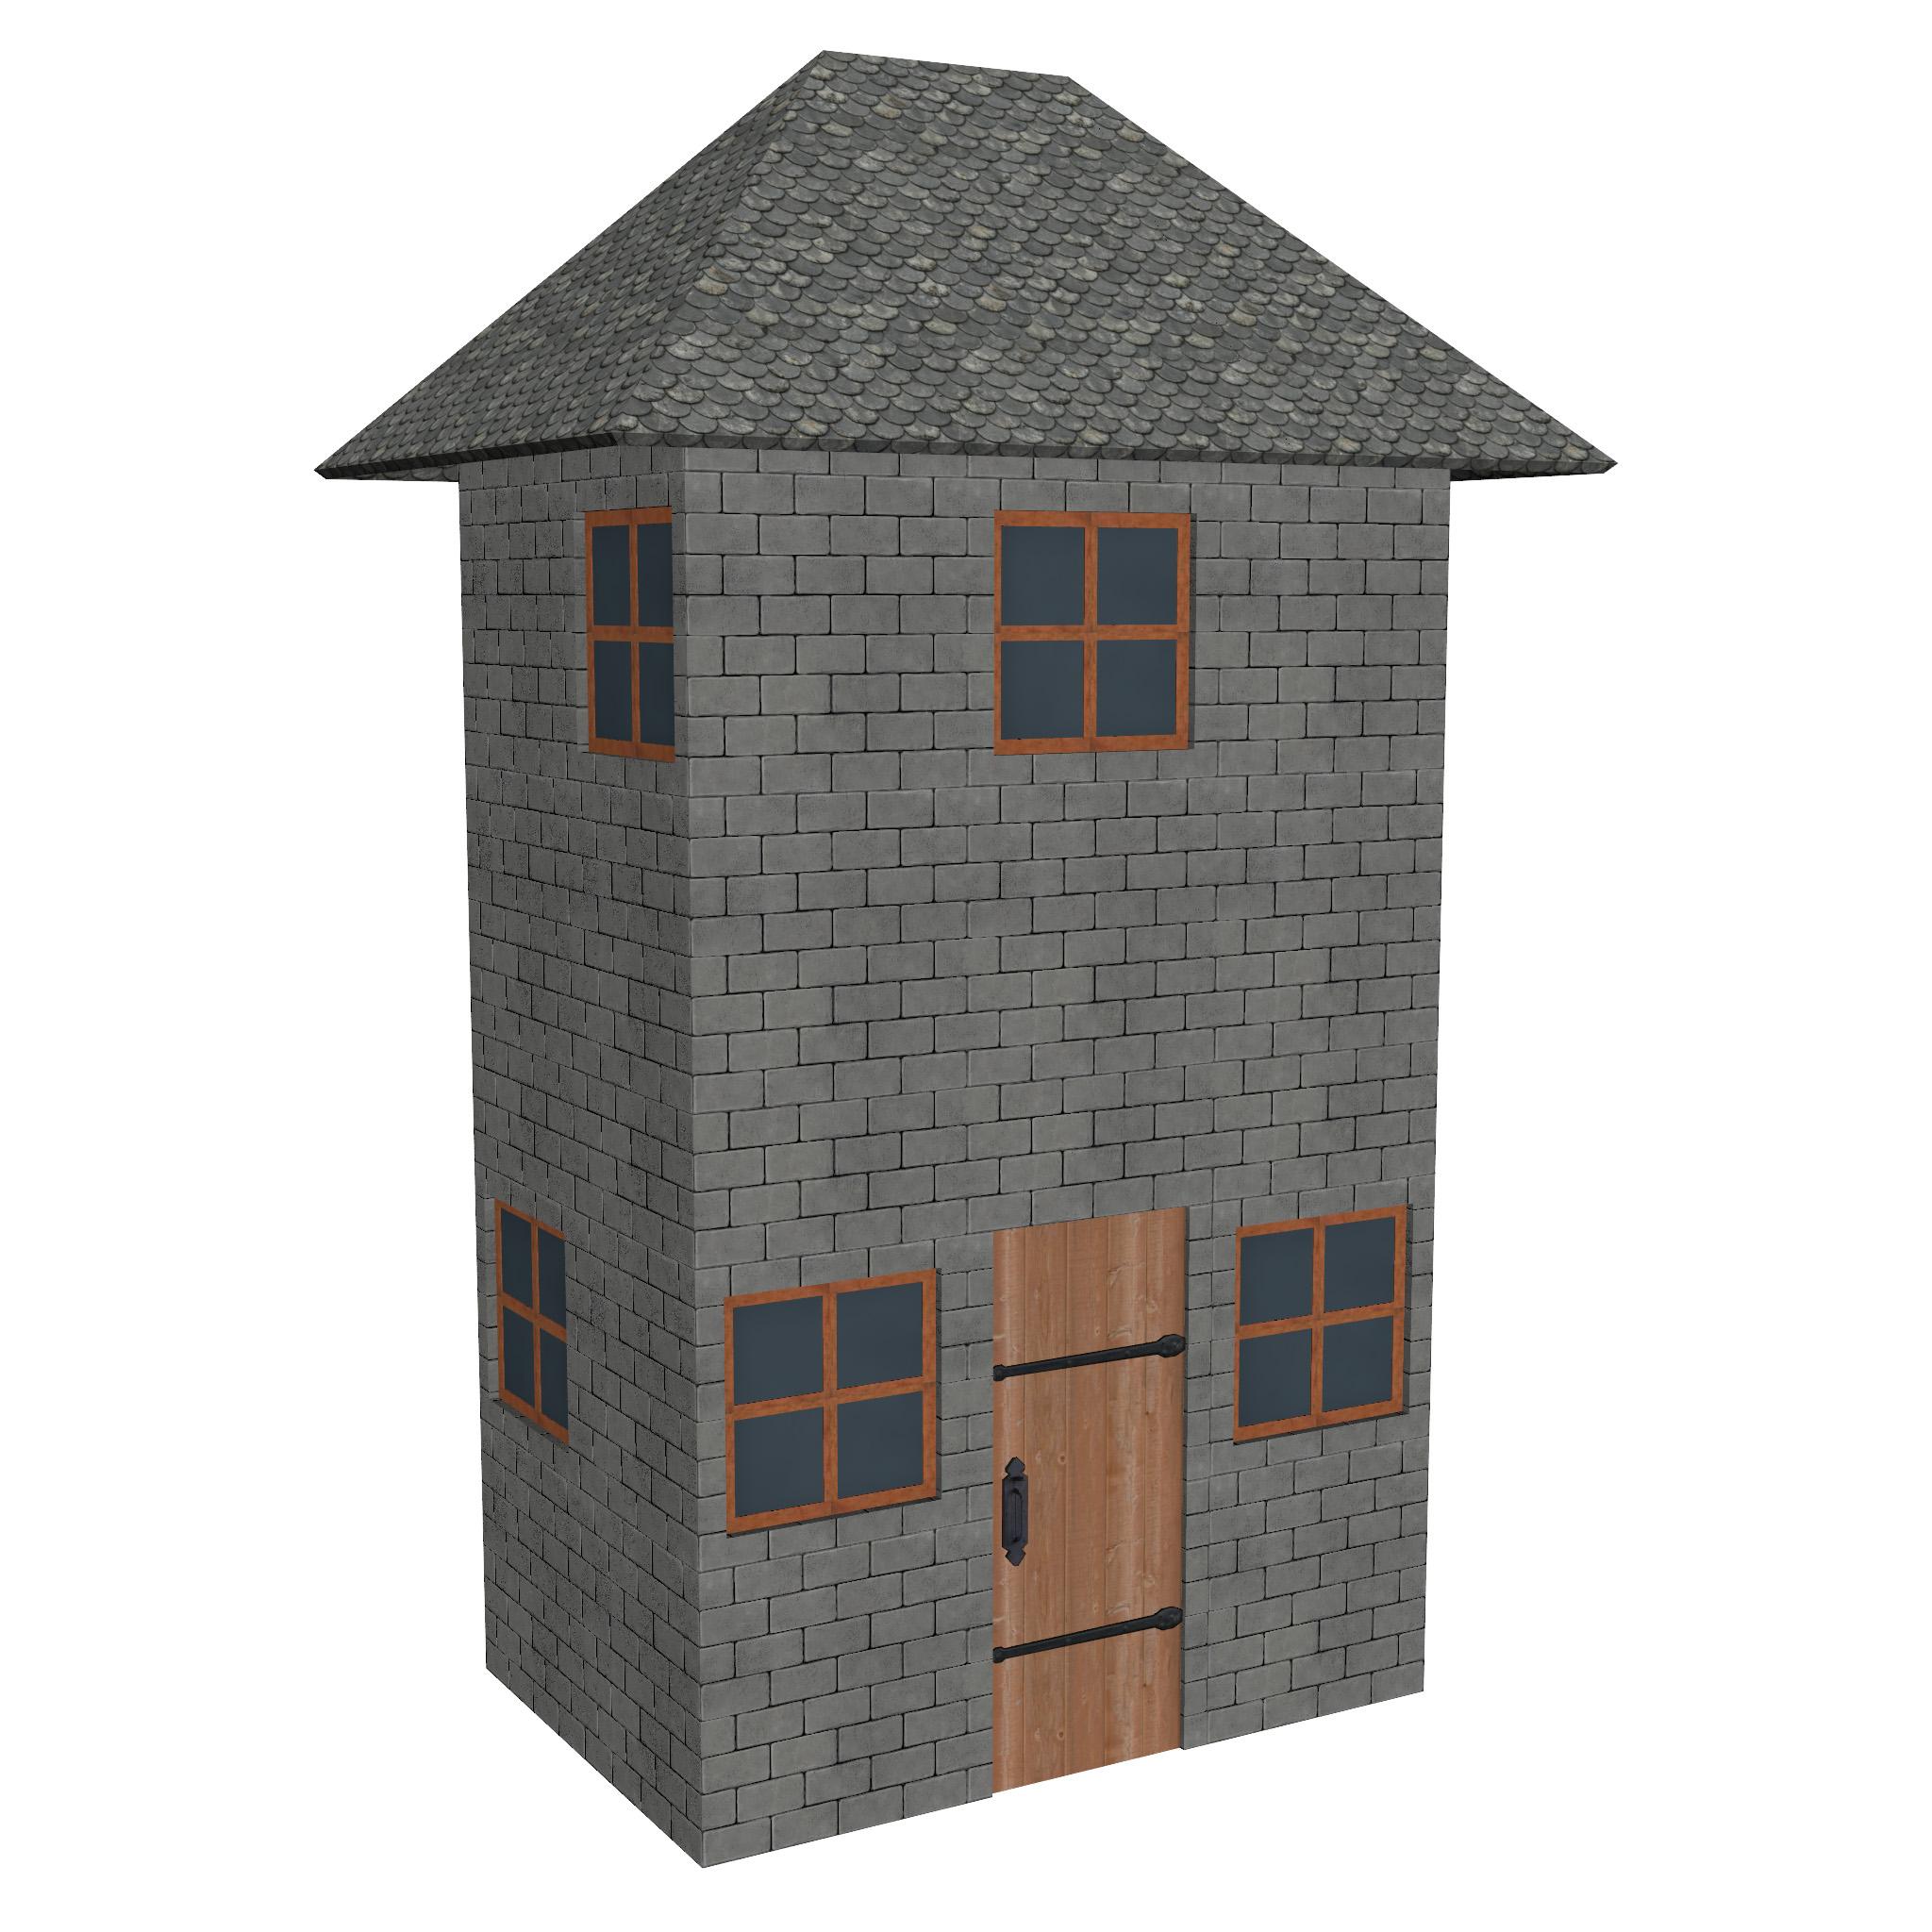 modular brick house set 3d model fbx ma mb 271404